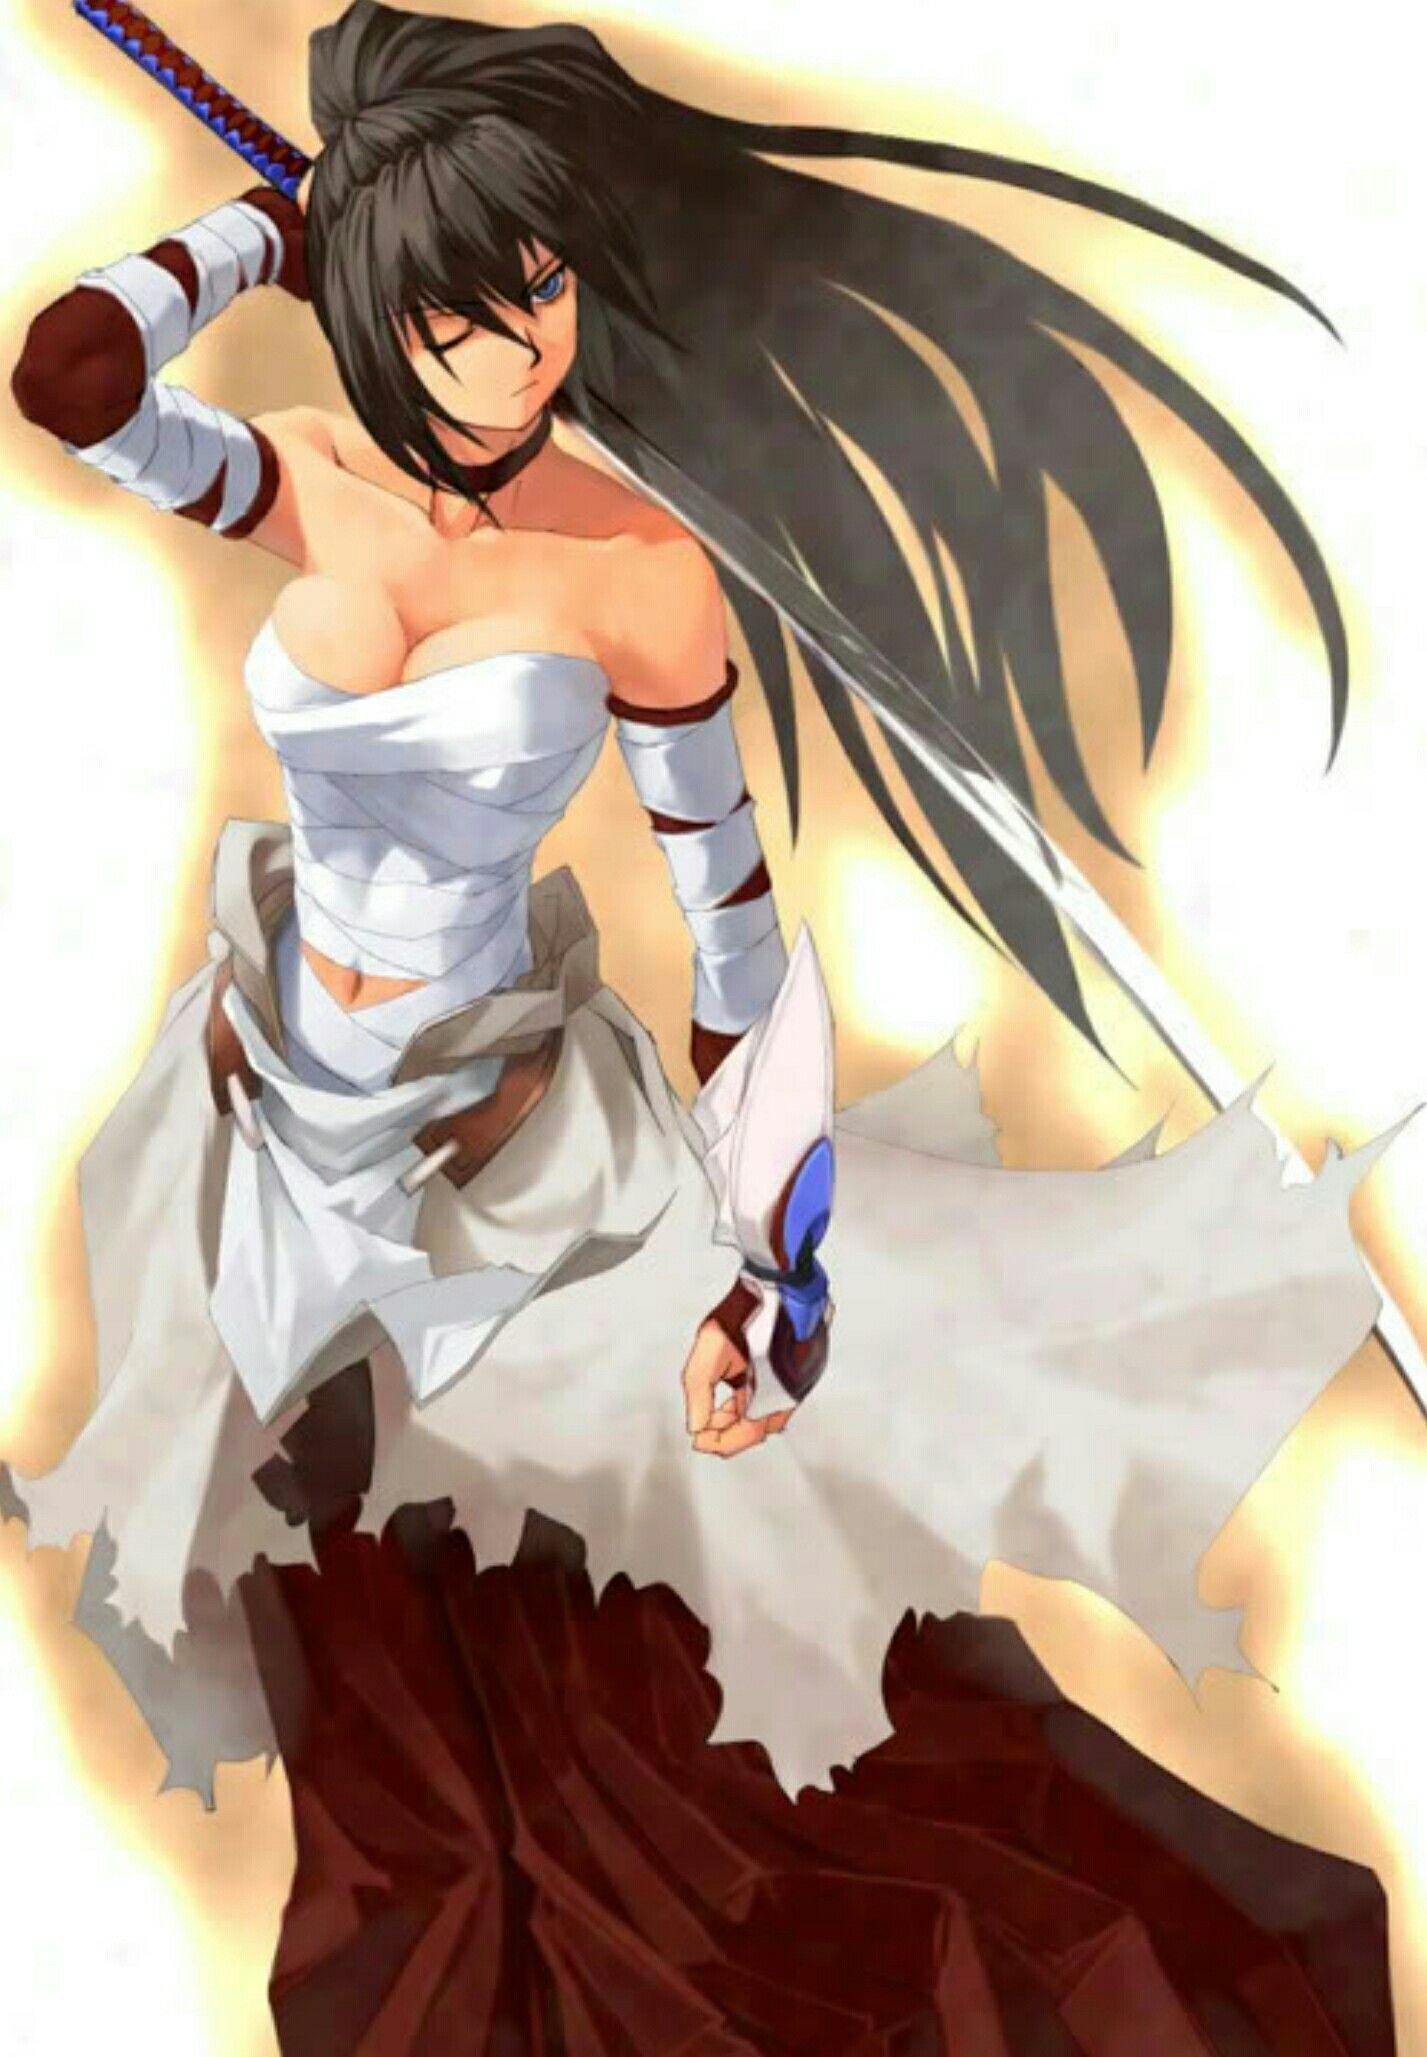 Pin By Harlowpain On Anime Females Samurai Anime Anime Warrior